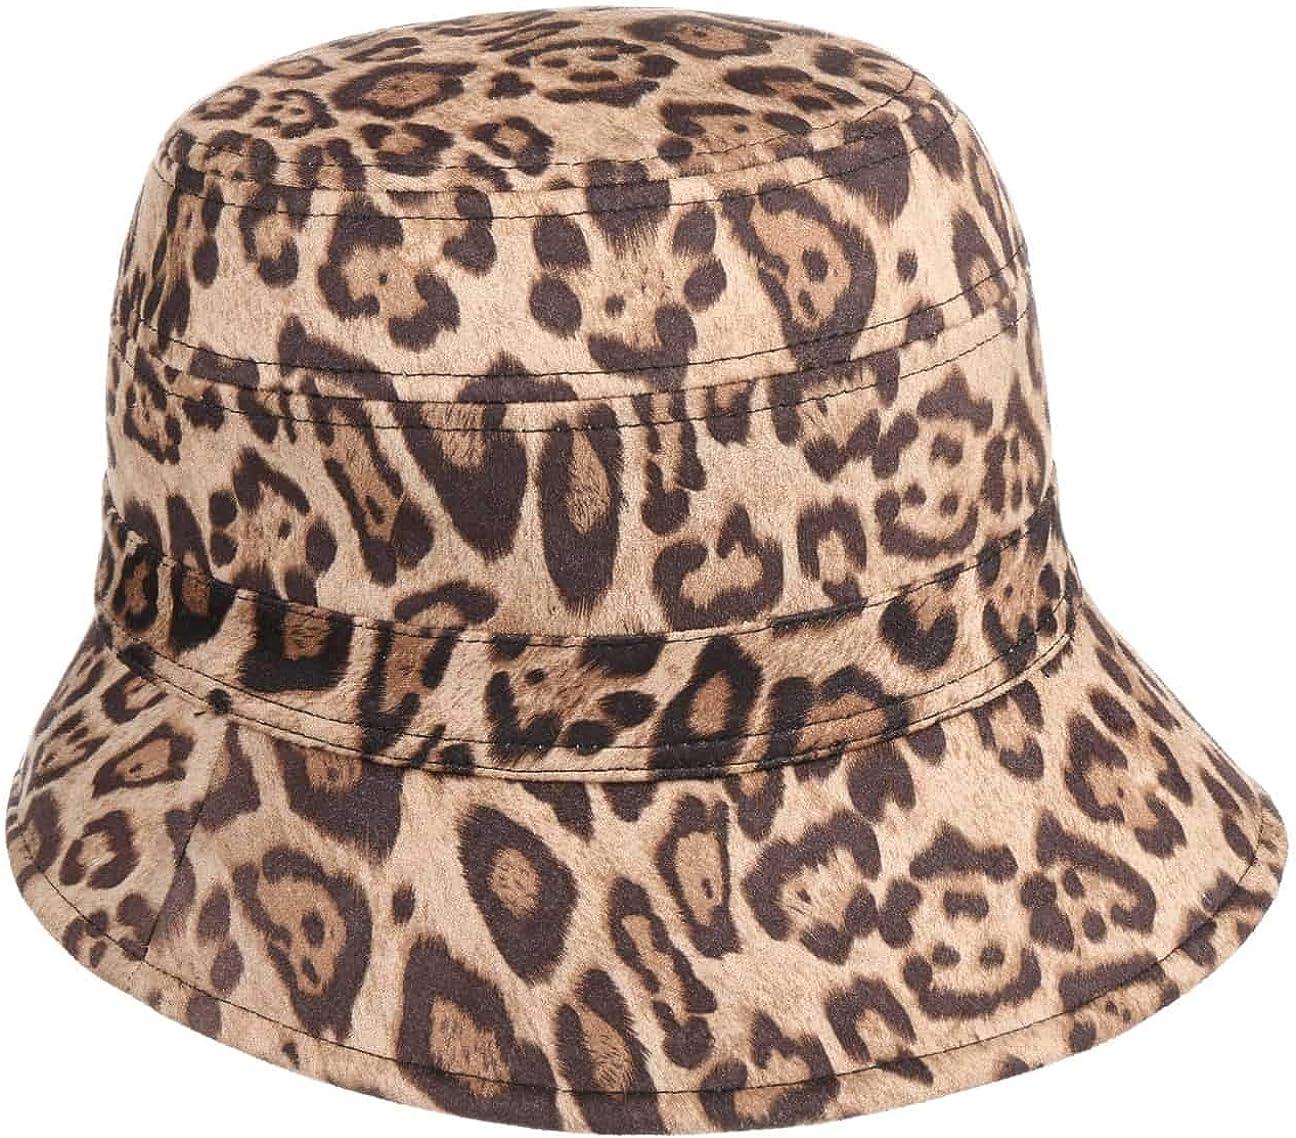 Seeberger Reversible Hat with セール特価品 Leopard Print アイテム勢ぞろい Winter Cloth